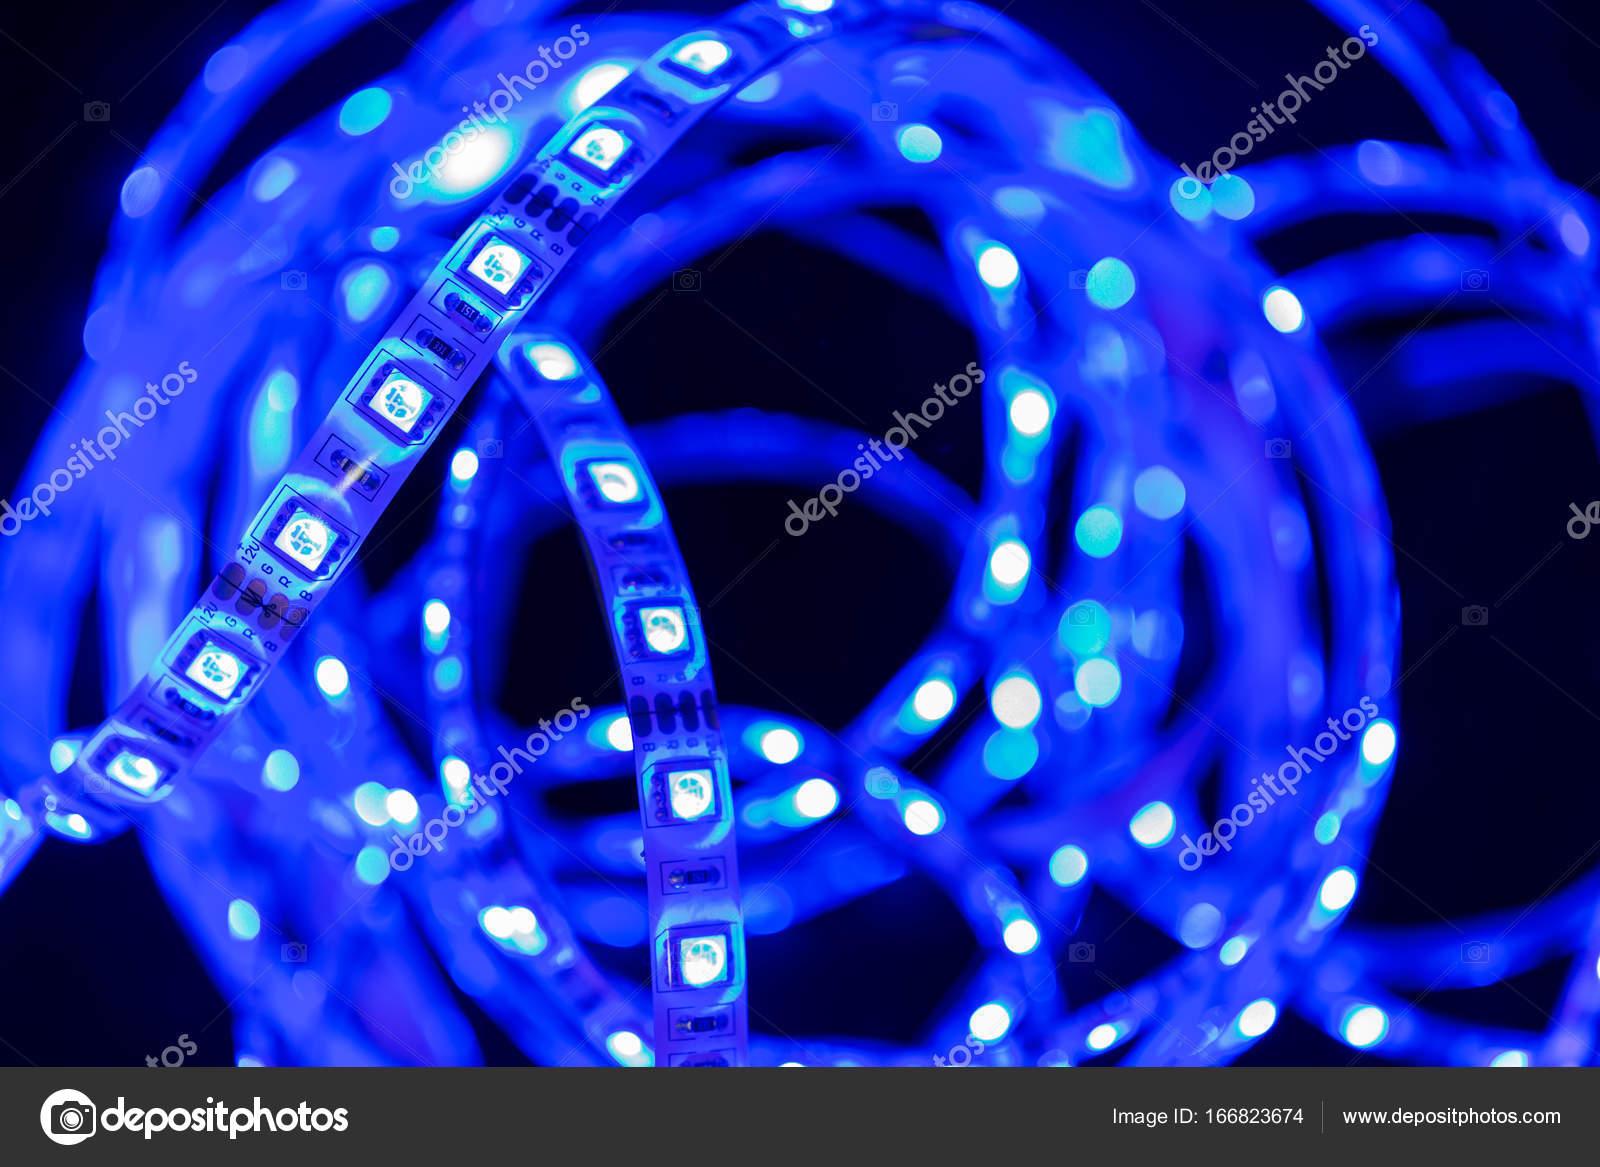 Led Strip Licht : Licht led streifen u stockfoto studio stock